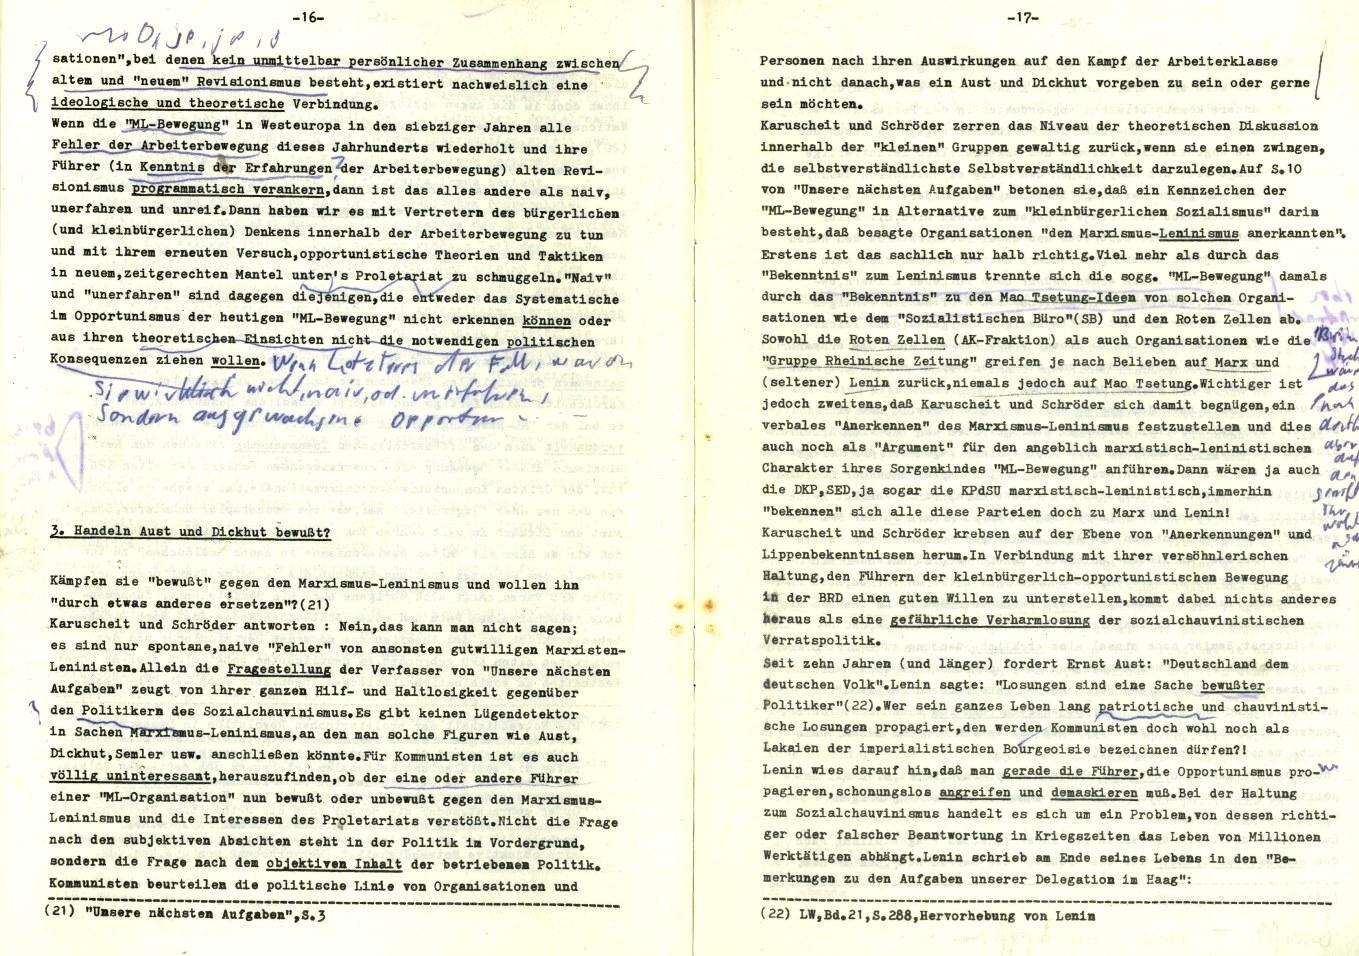 Muenchen_Kampf_dem_Revisionismus_1978_07_09